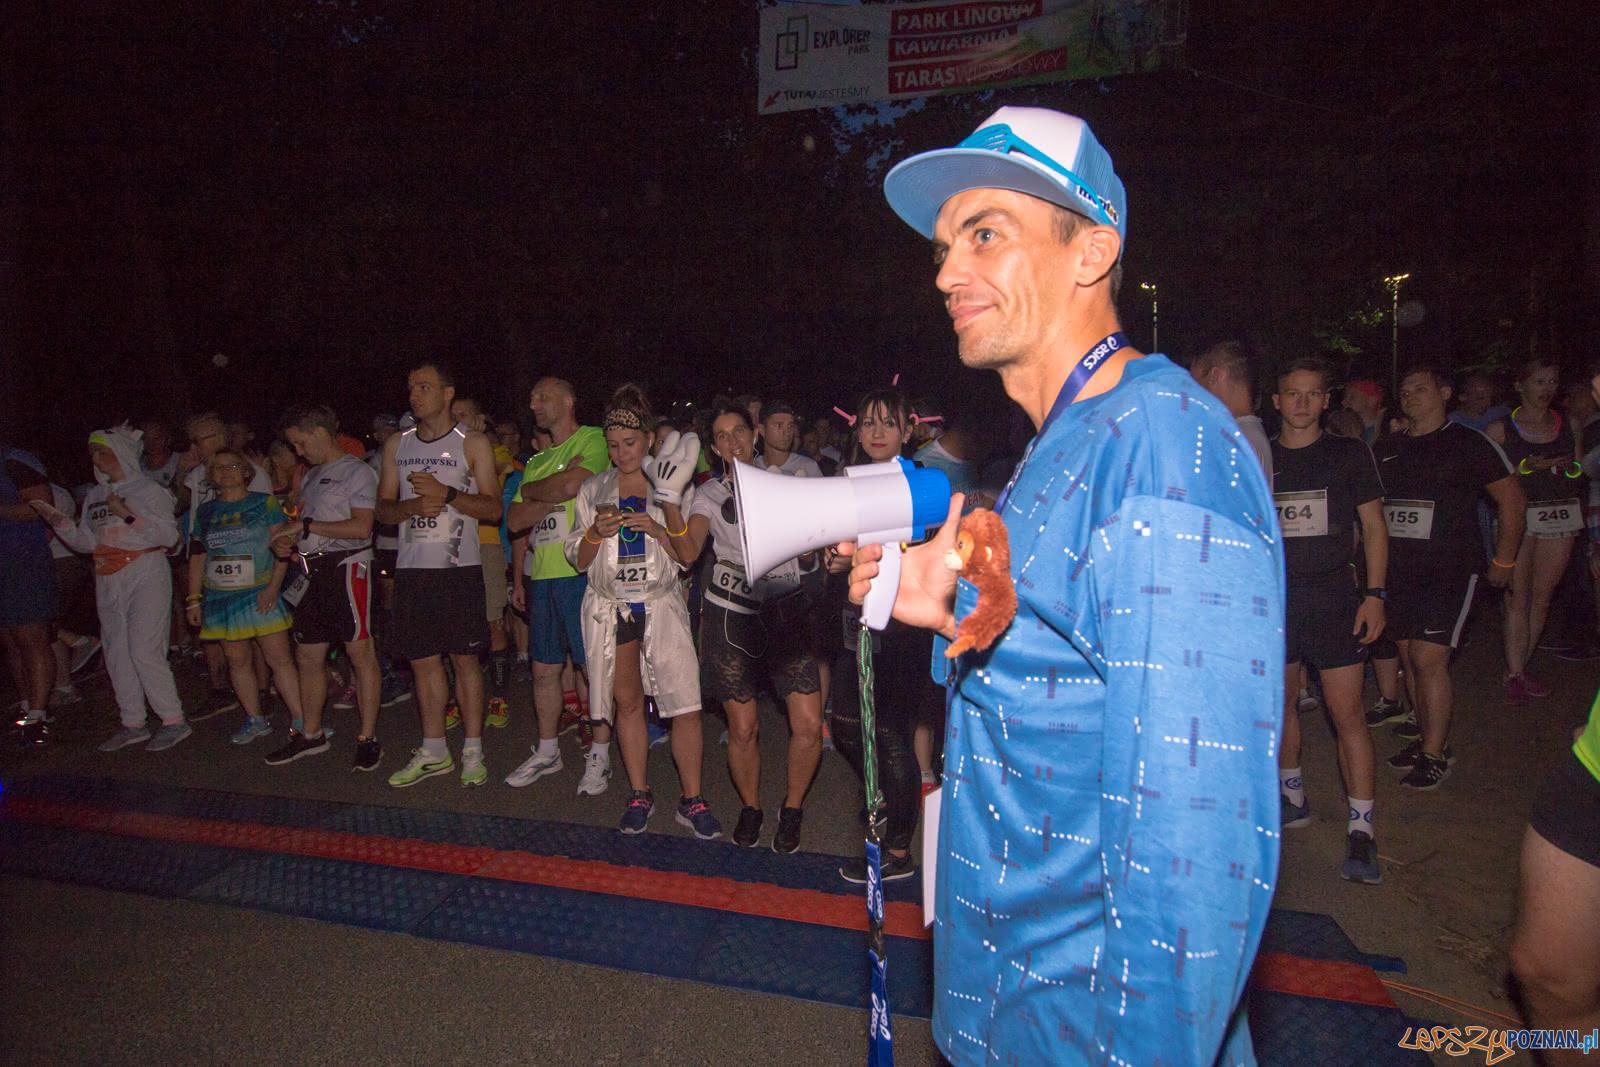 5. Nocna Recordowa Ncna Piątka  Foto: lepszyPOZNAN.pl/Piotr Rychter